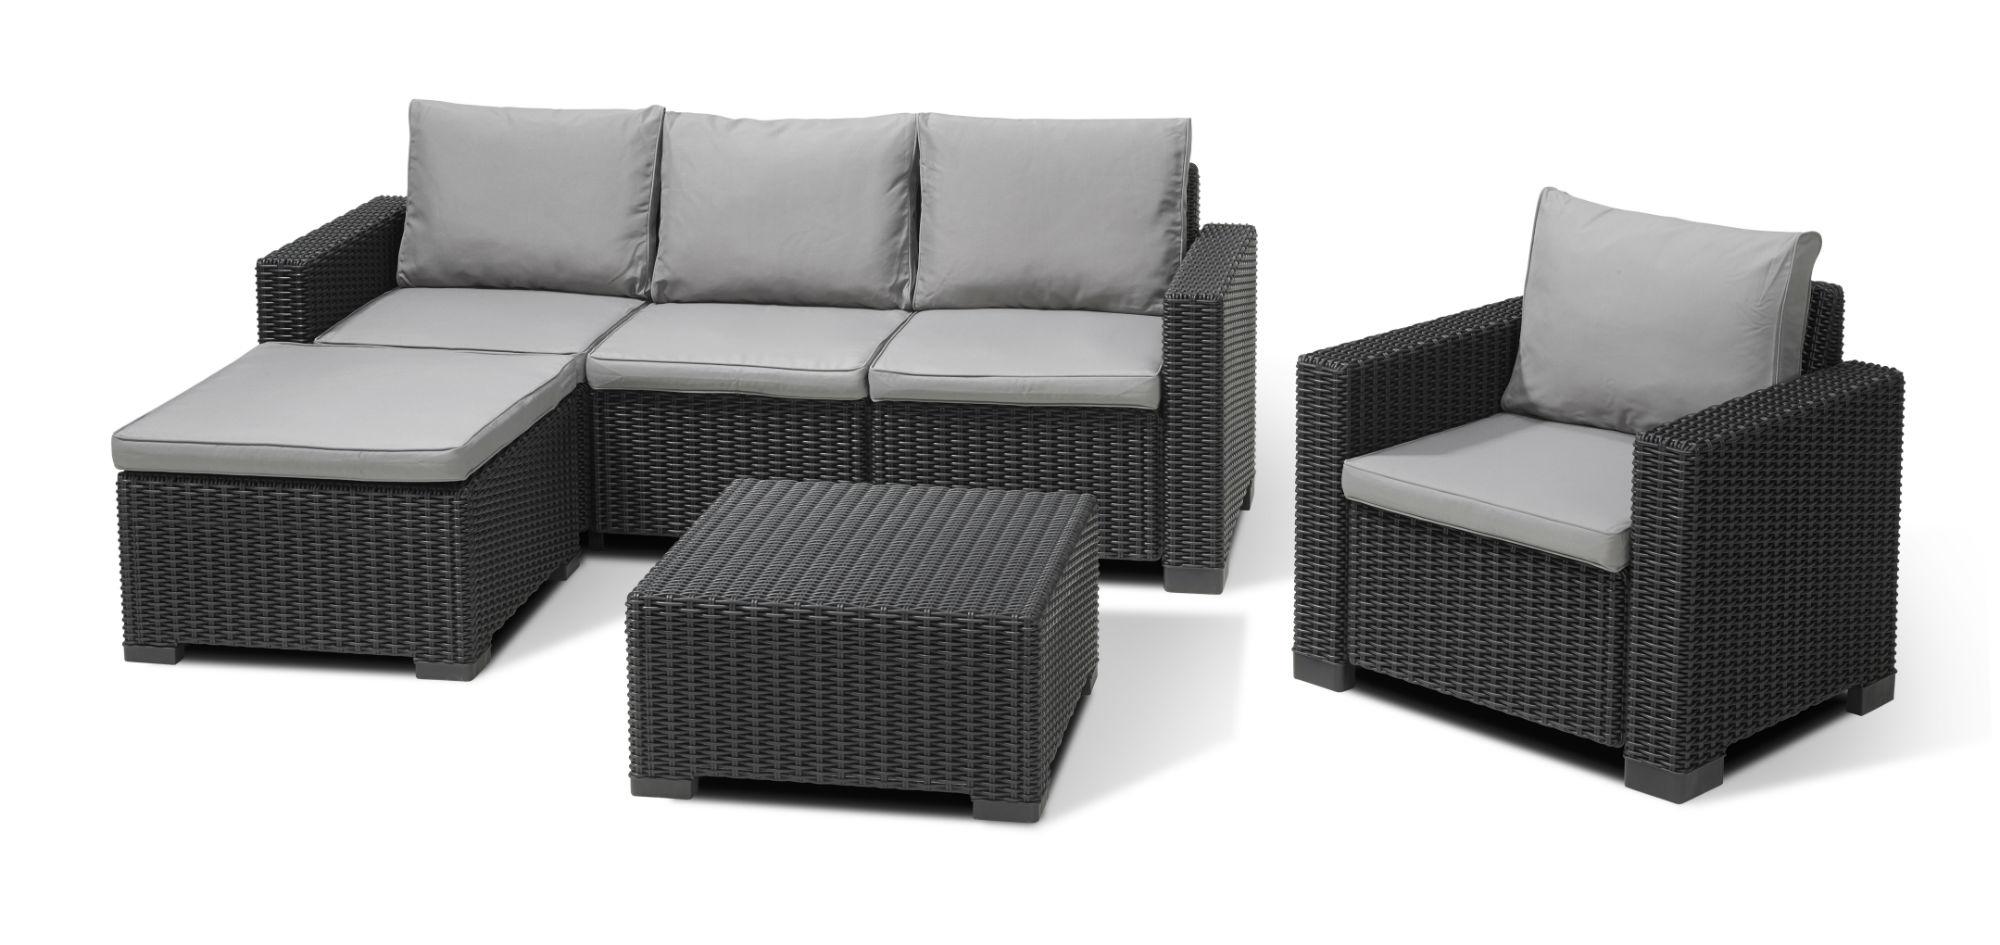 Allibert Moorea Lounge Set Graphite - Allibert pour Salon De Jardin Allibert California